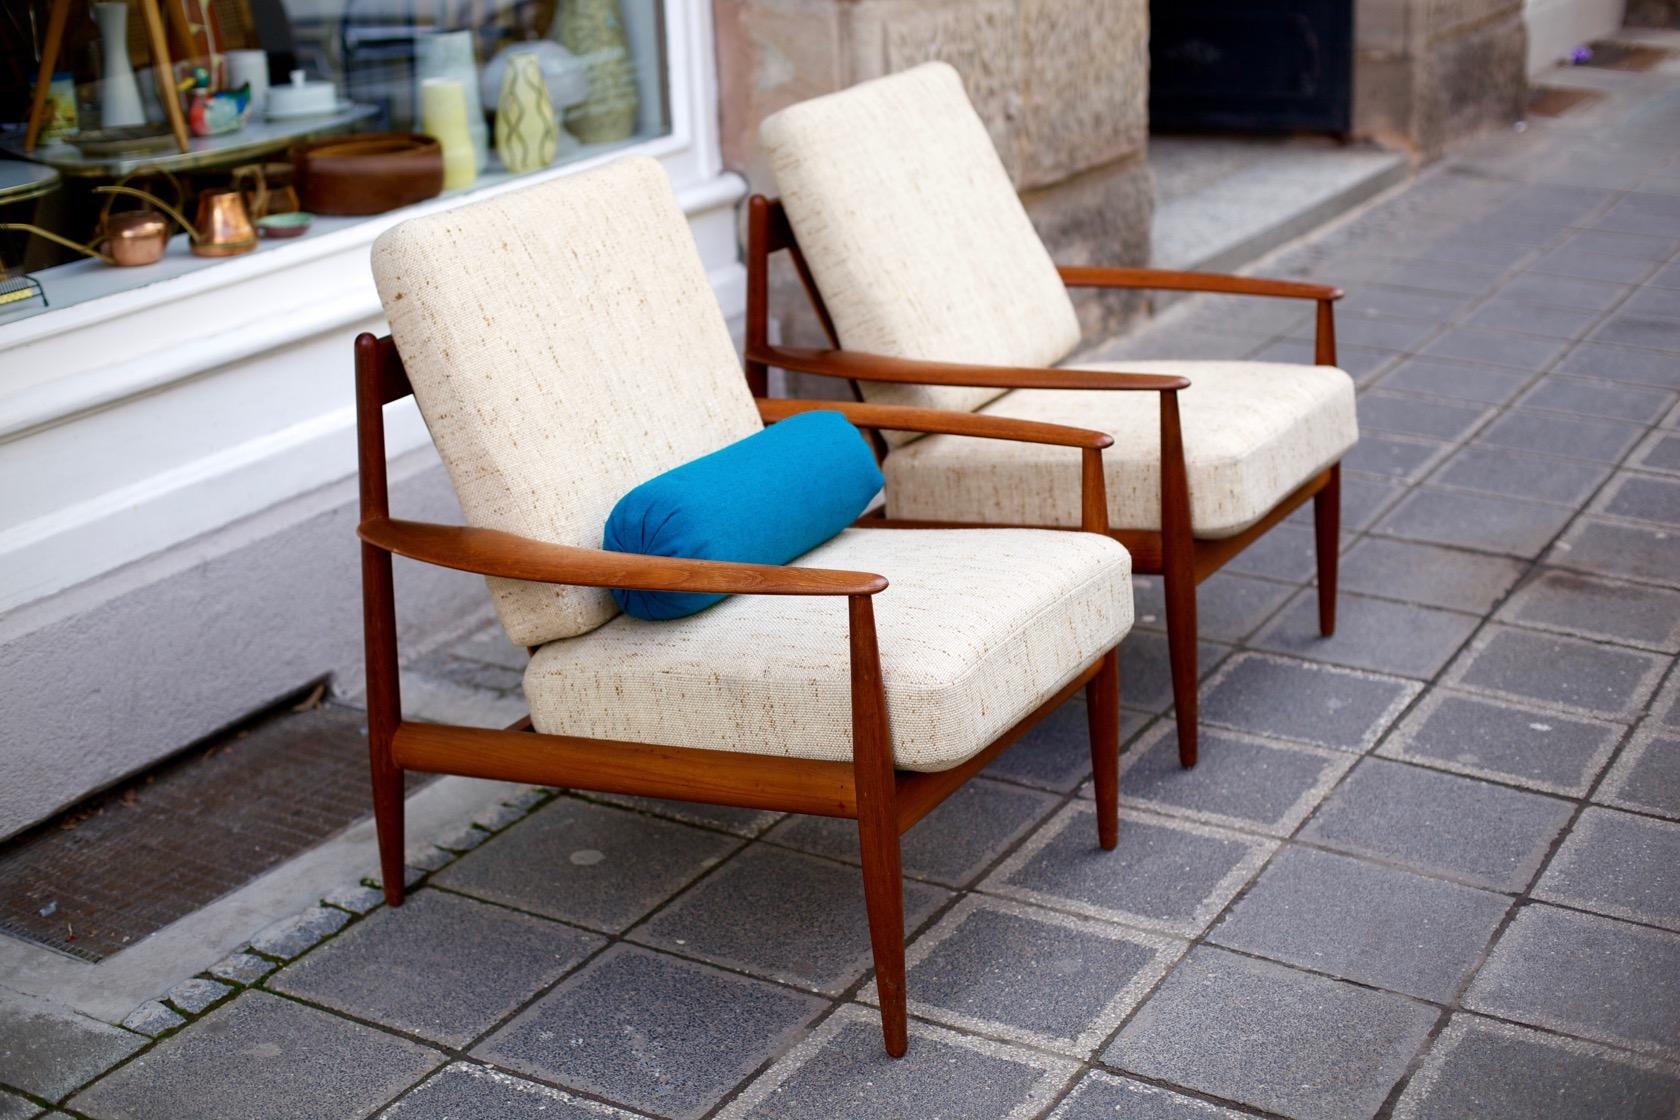 Danische Designklassiker Zwei Sessel Von Grete Jalk